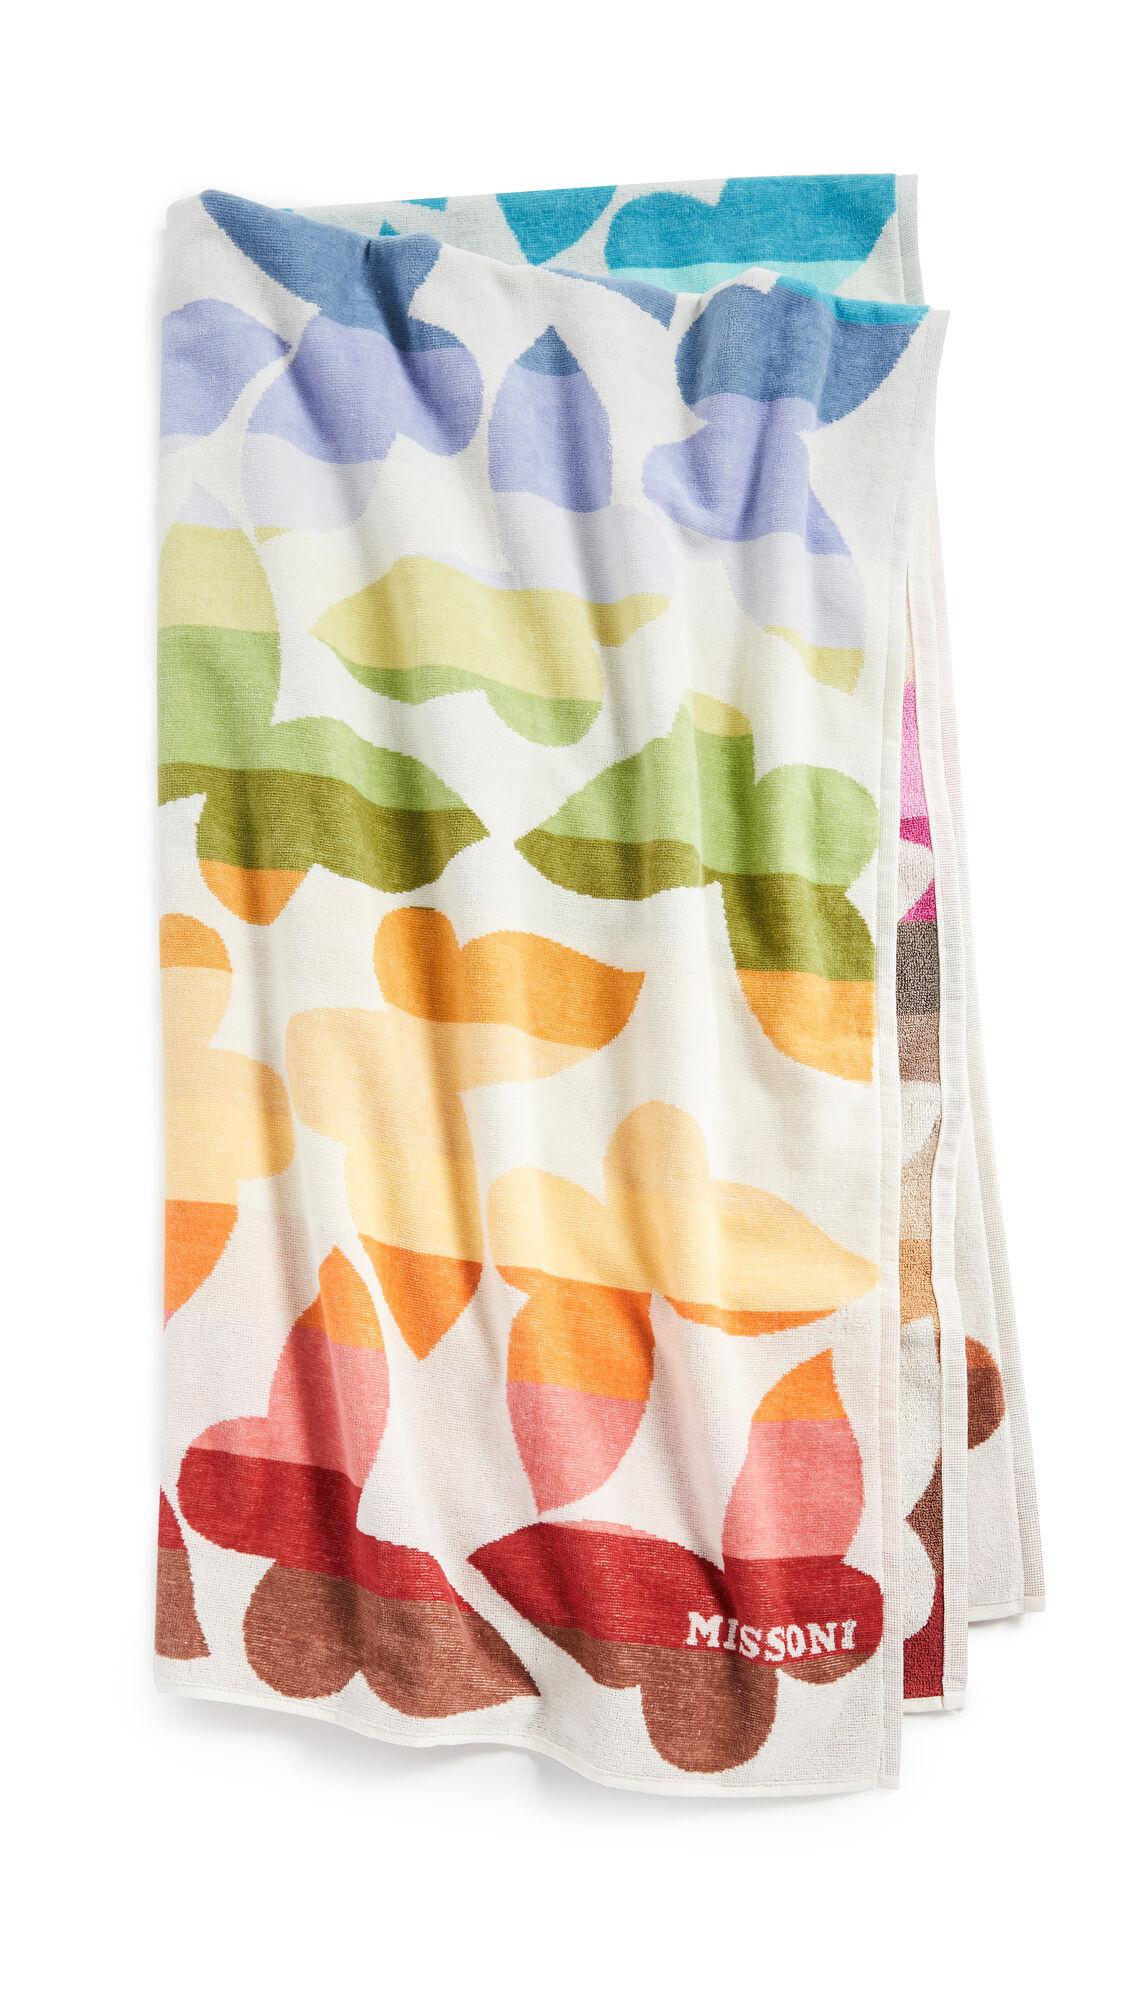 Missoni Home Jamelia Beach Towel  - Multicolor - Size: One Size